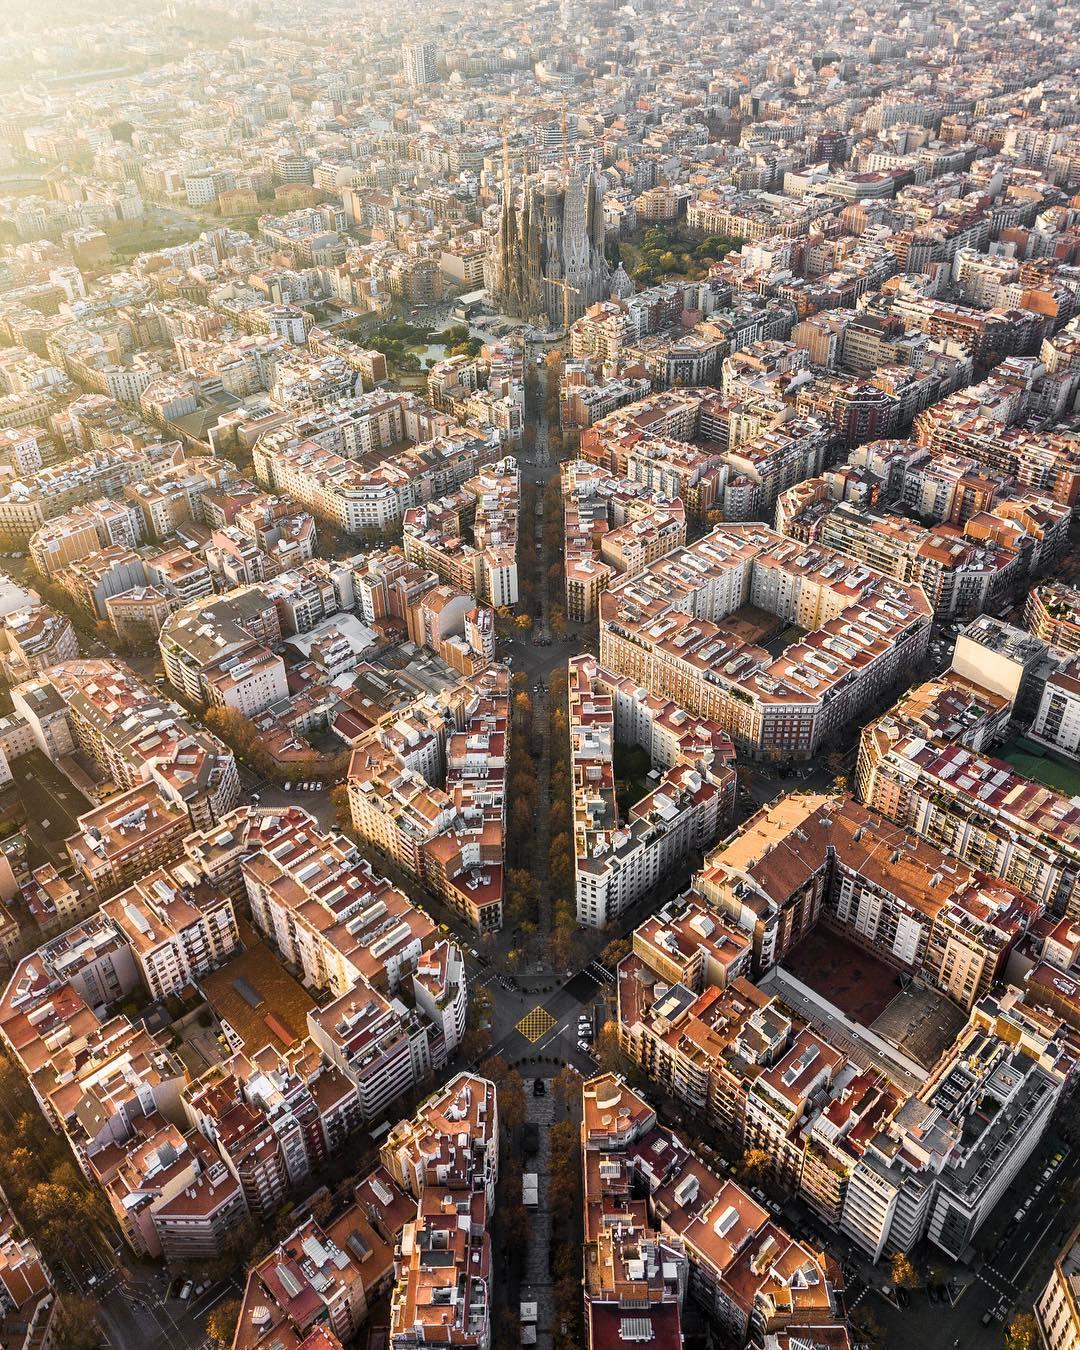 Barcelona aérea drone Marton Mogyorosy loqueva (15)